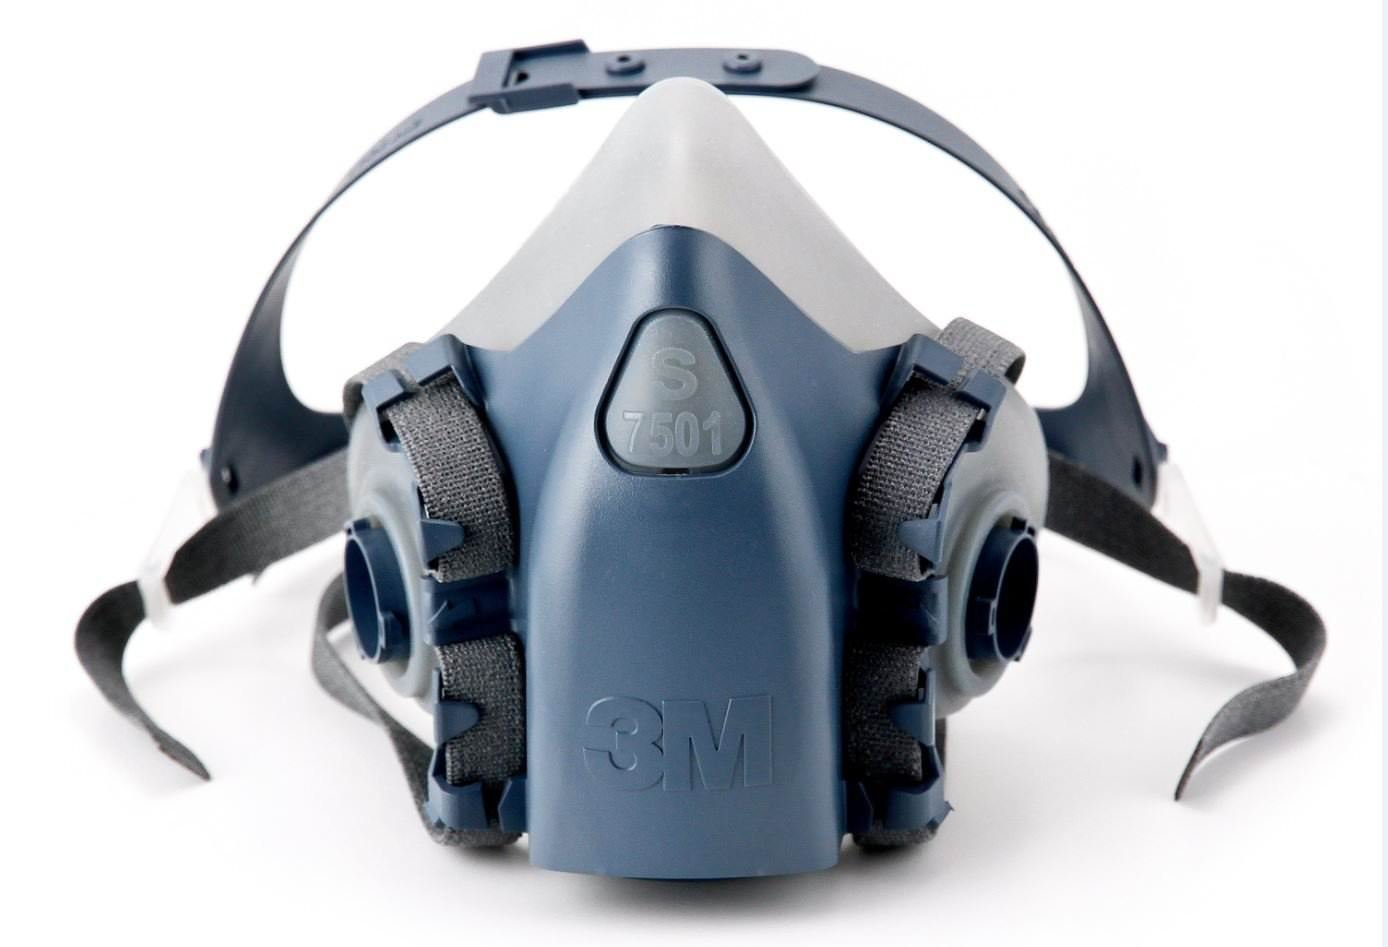 3 M Small半分Facepiece再利用可能な保護マスク7501 /37081 (AAD) 呼吸保護 3 Set (Small)   B07G2R3RJT